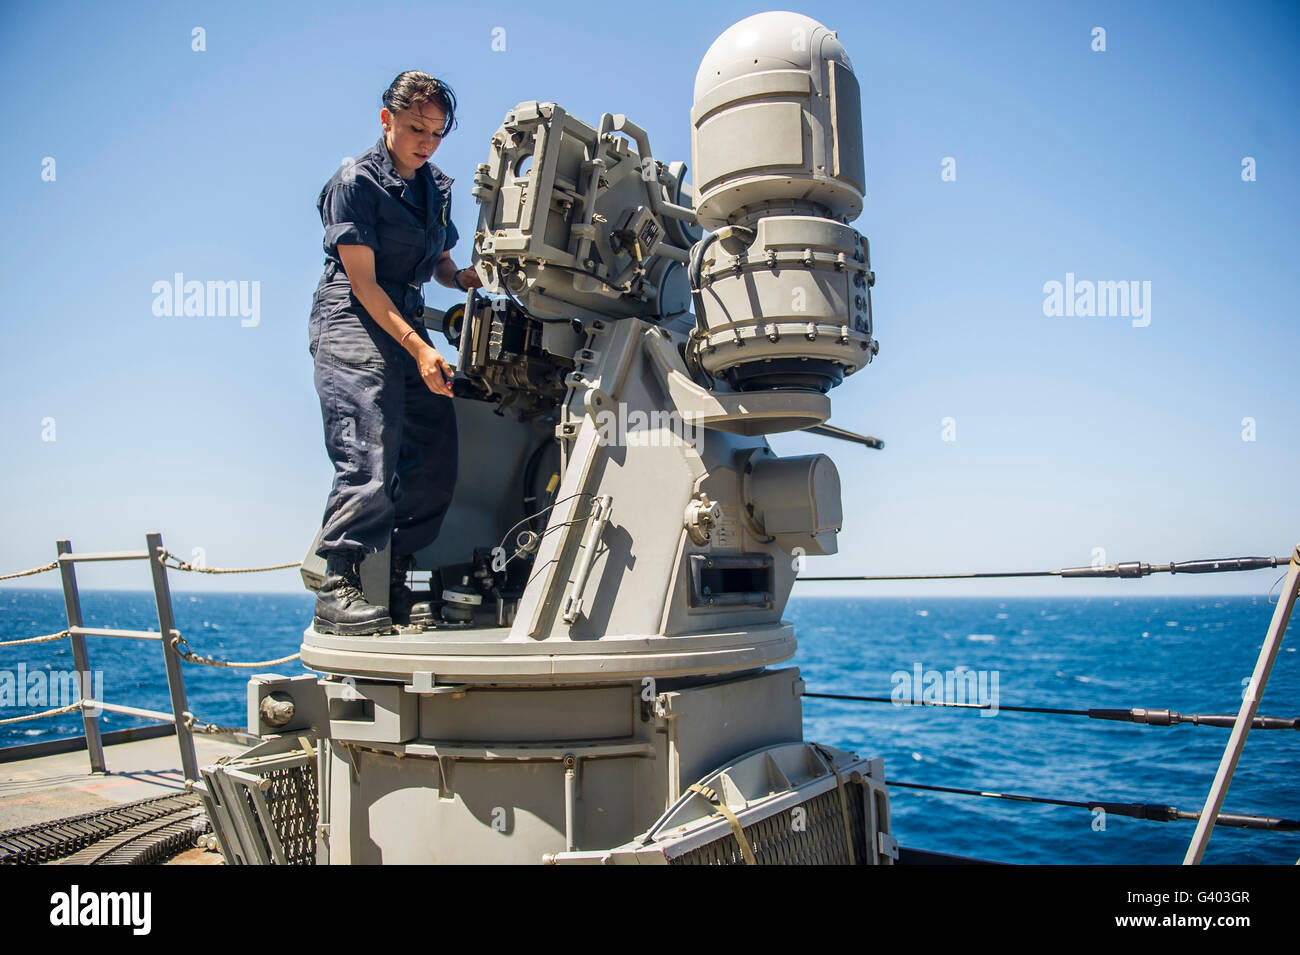 Seaman performs maintenance on a Mark 38 MOD 2 25mm machine gun/ - Stock Image